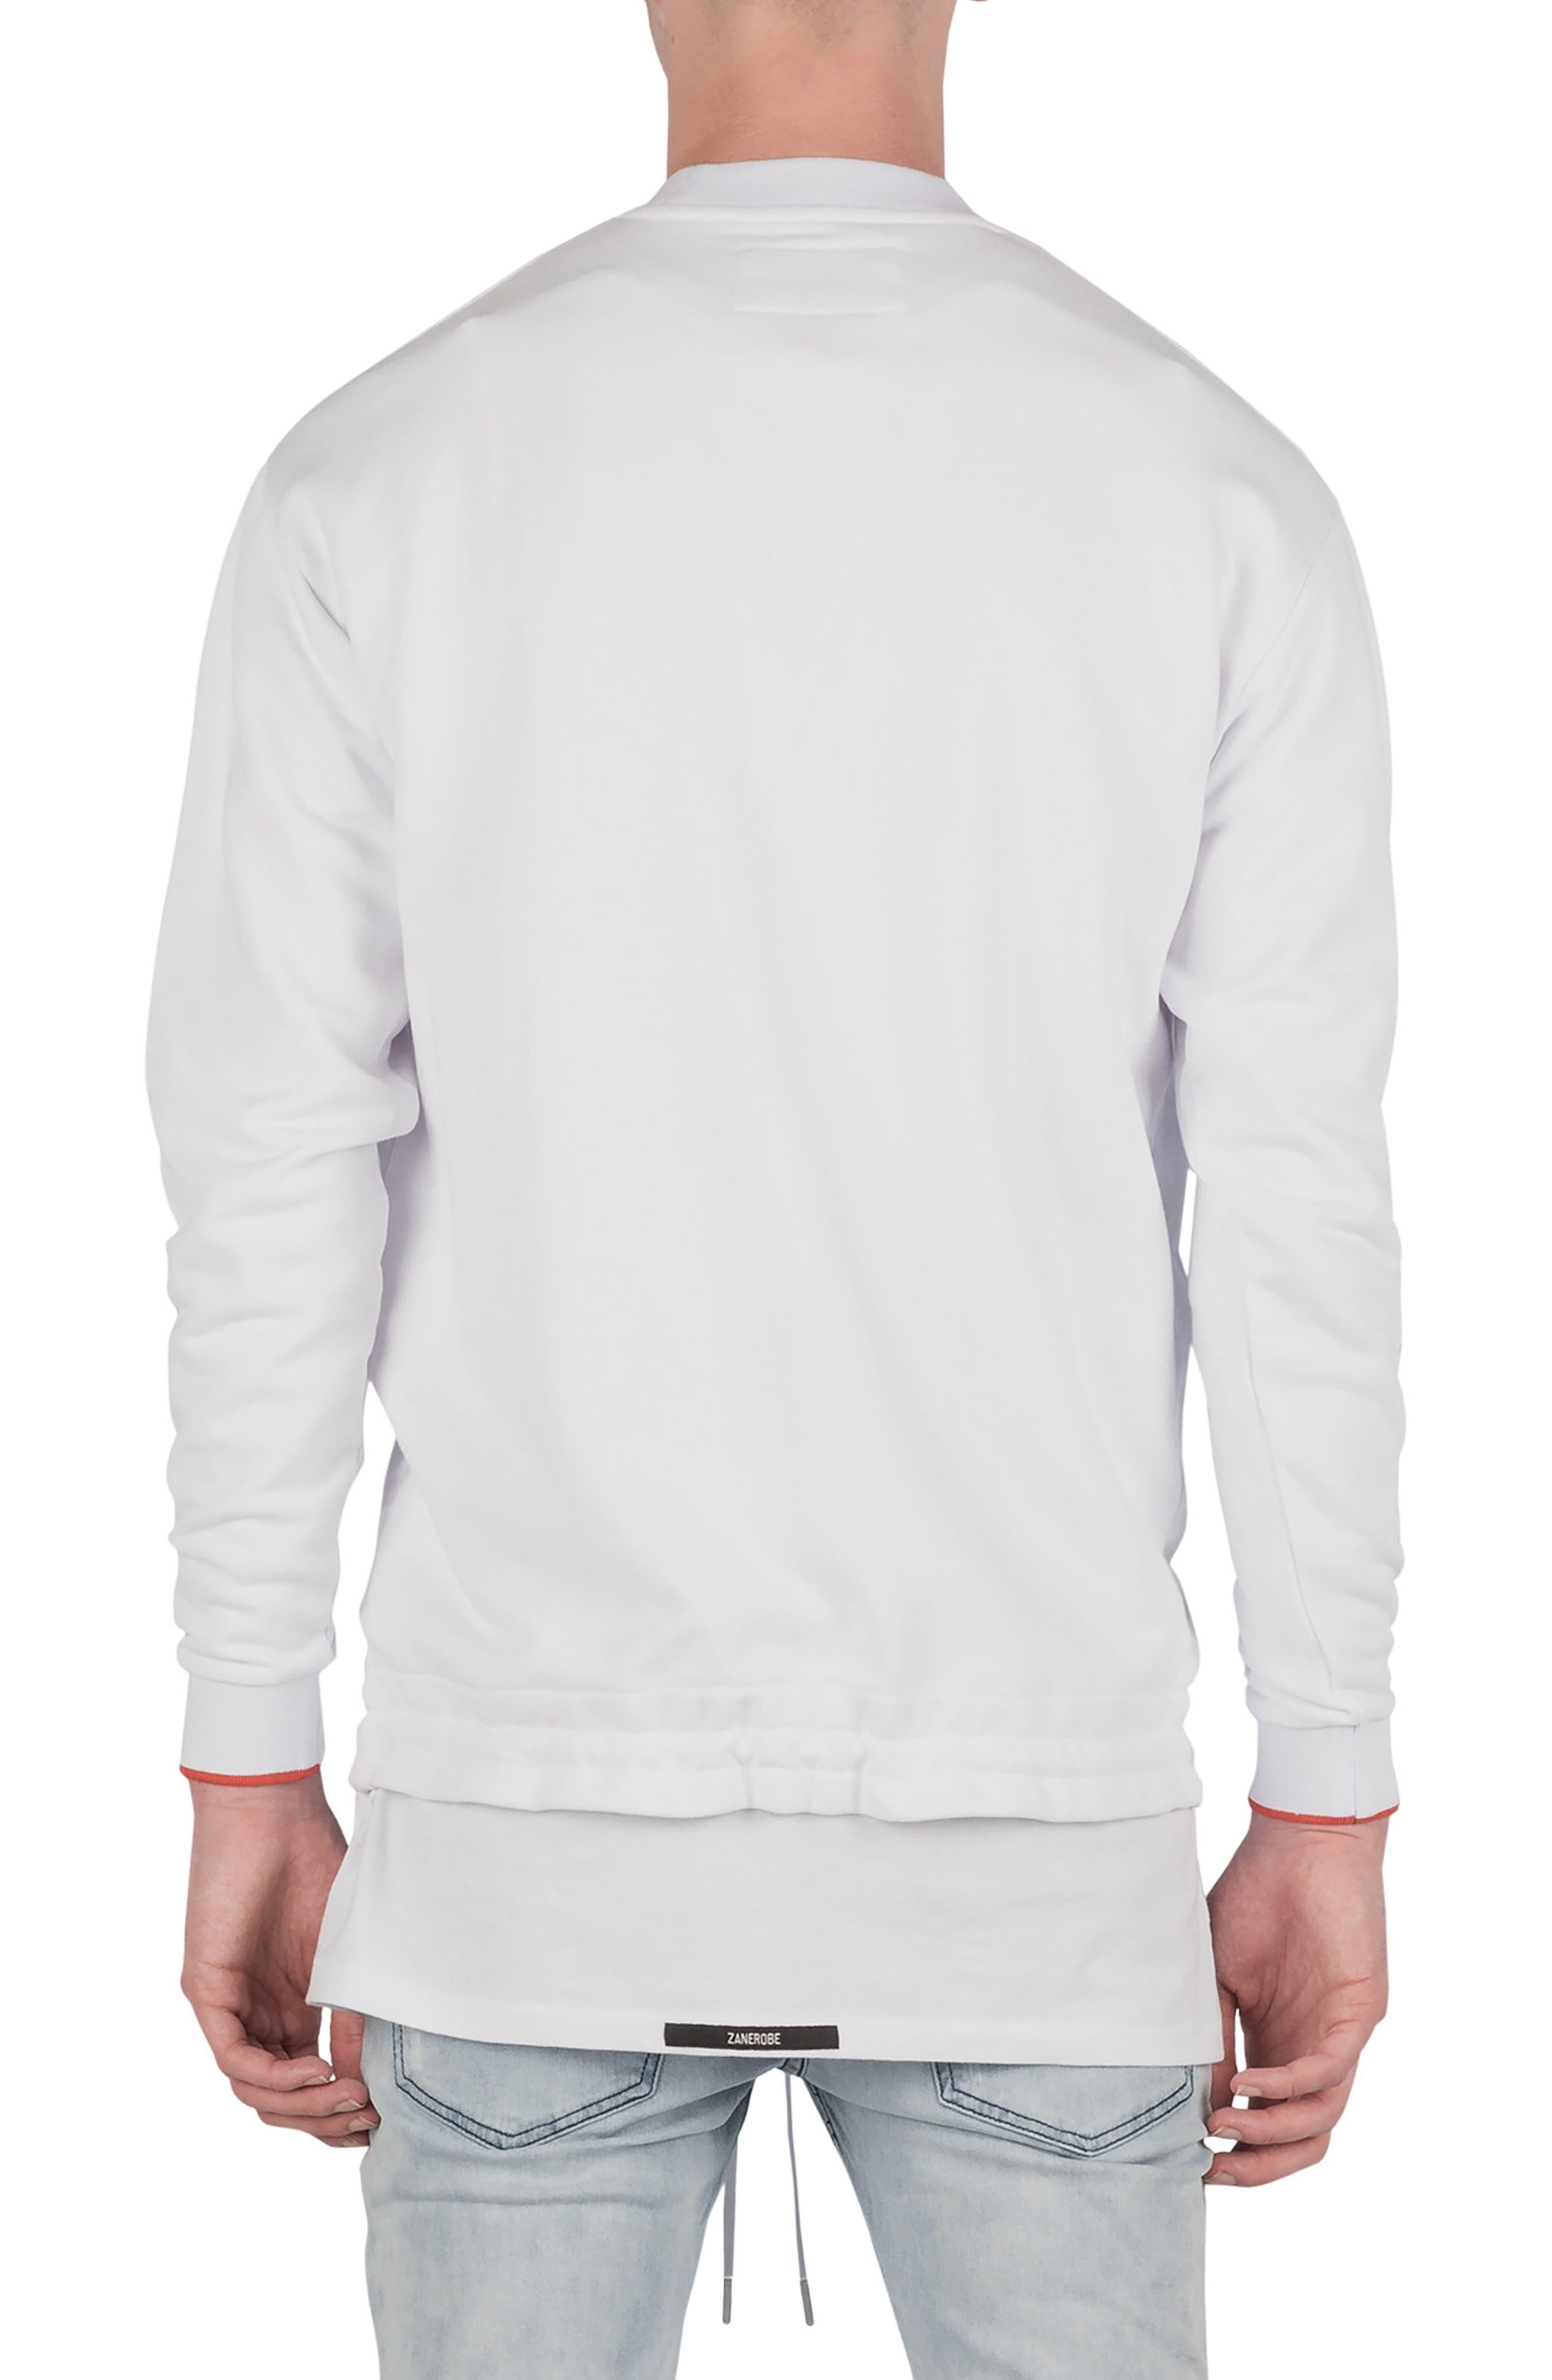 League Boxy Sweatshirt,                             Alternate thumbnail 2, color,                             WHITE